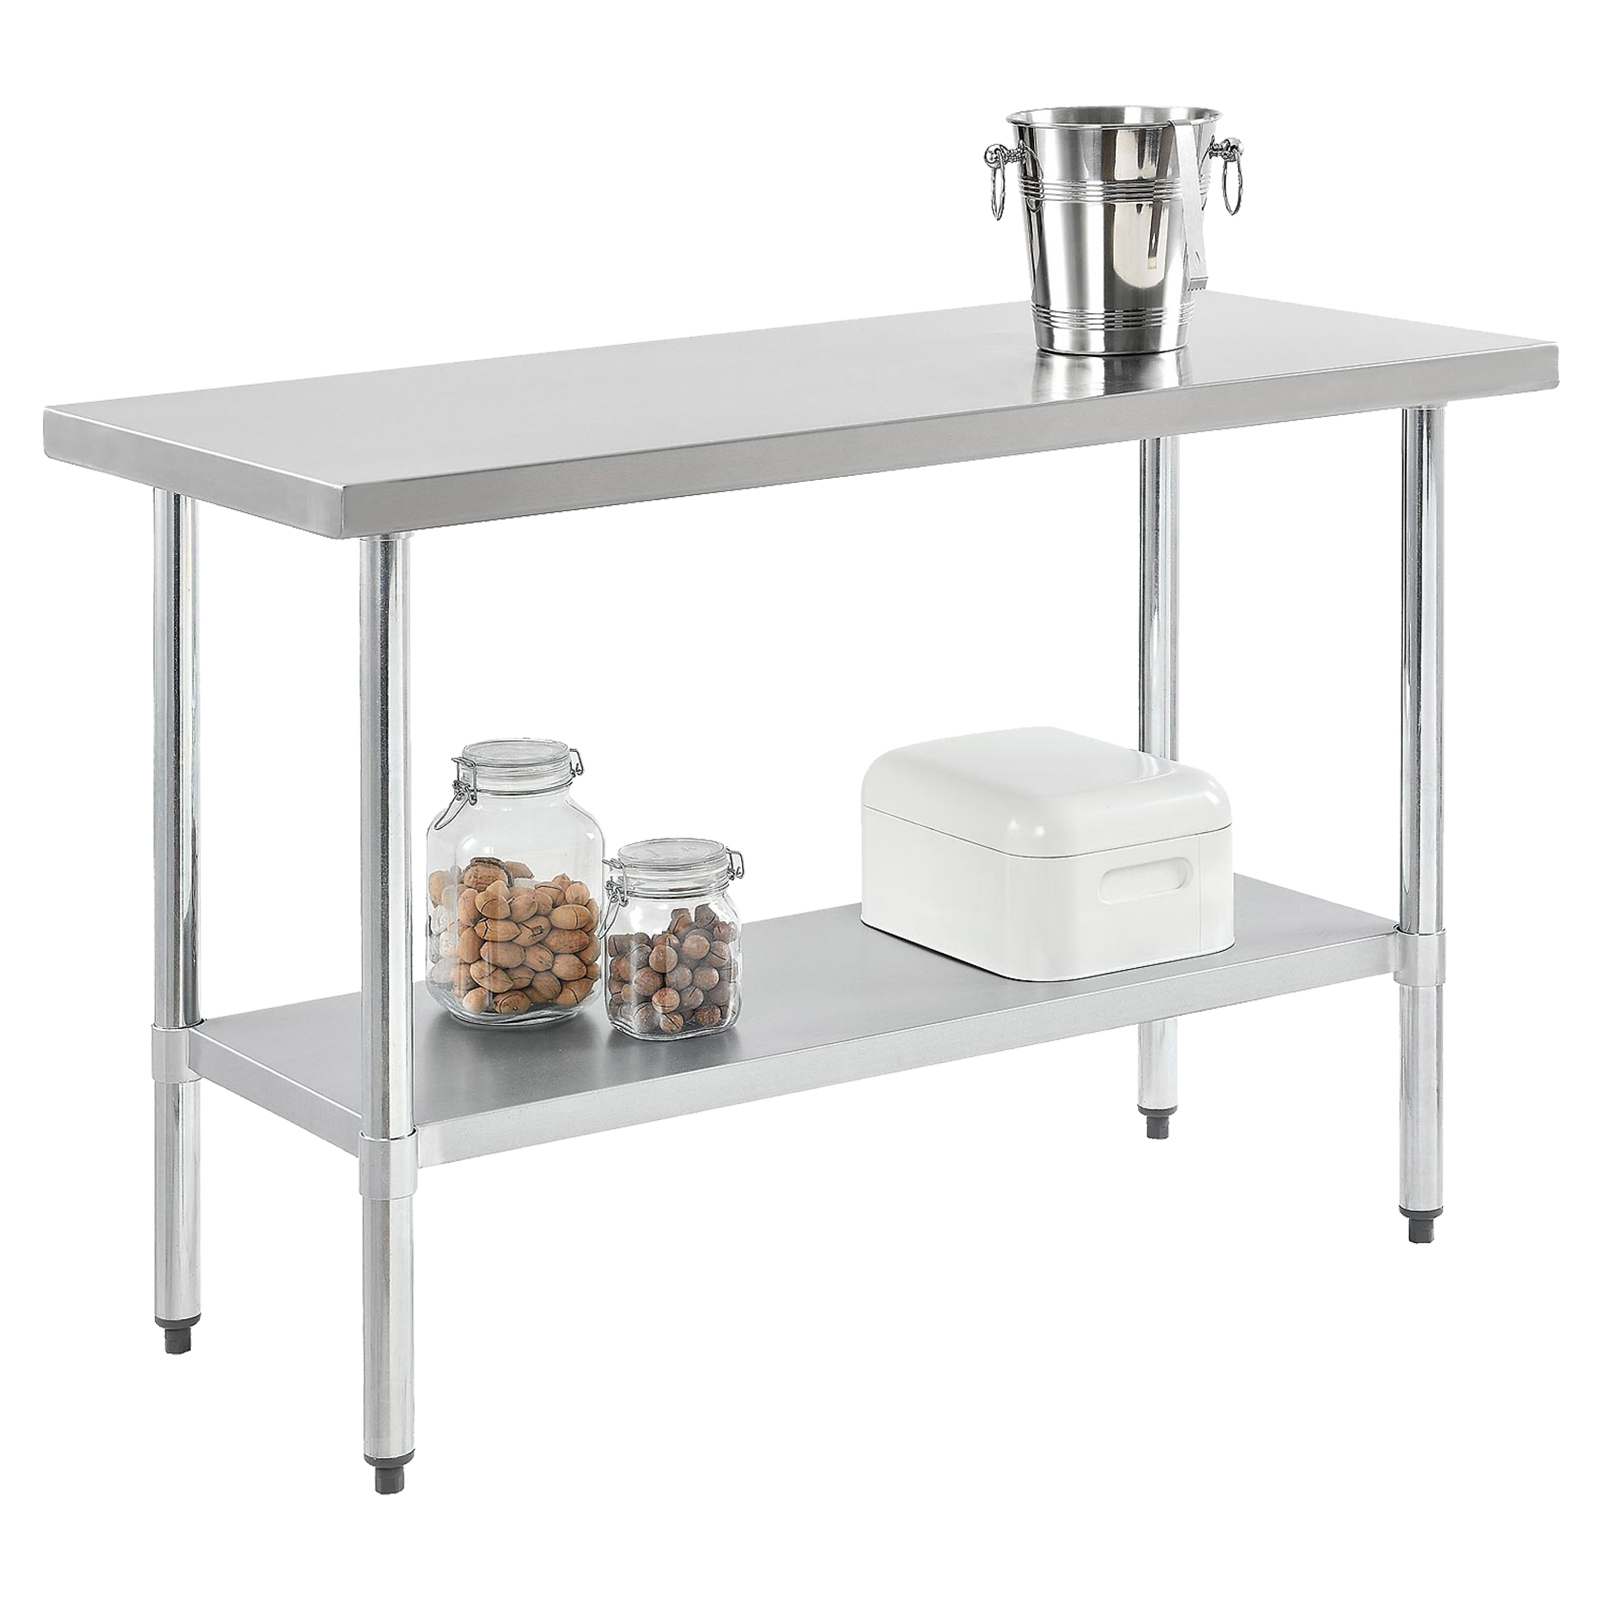 NEXEL WB7230SS work table,  63